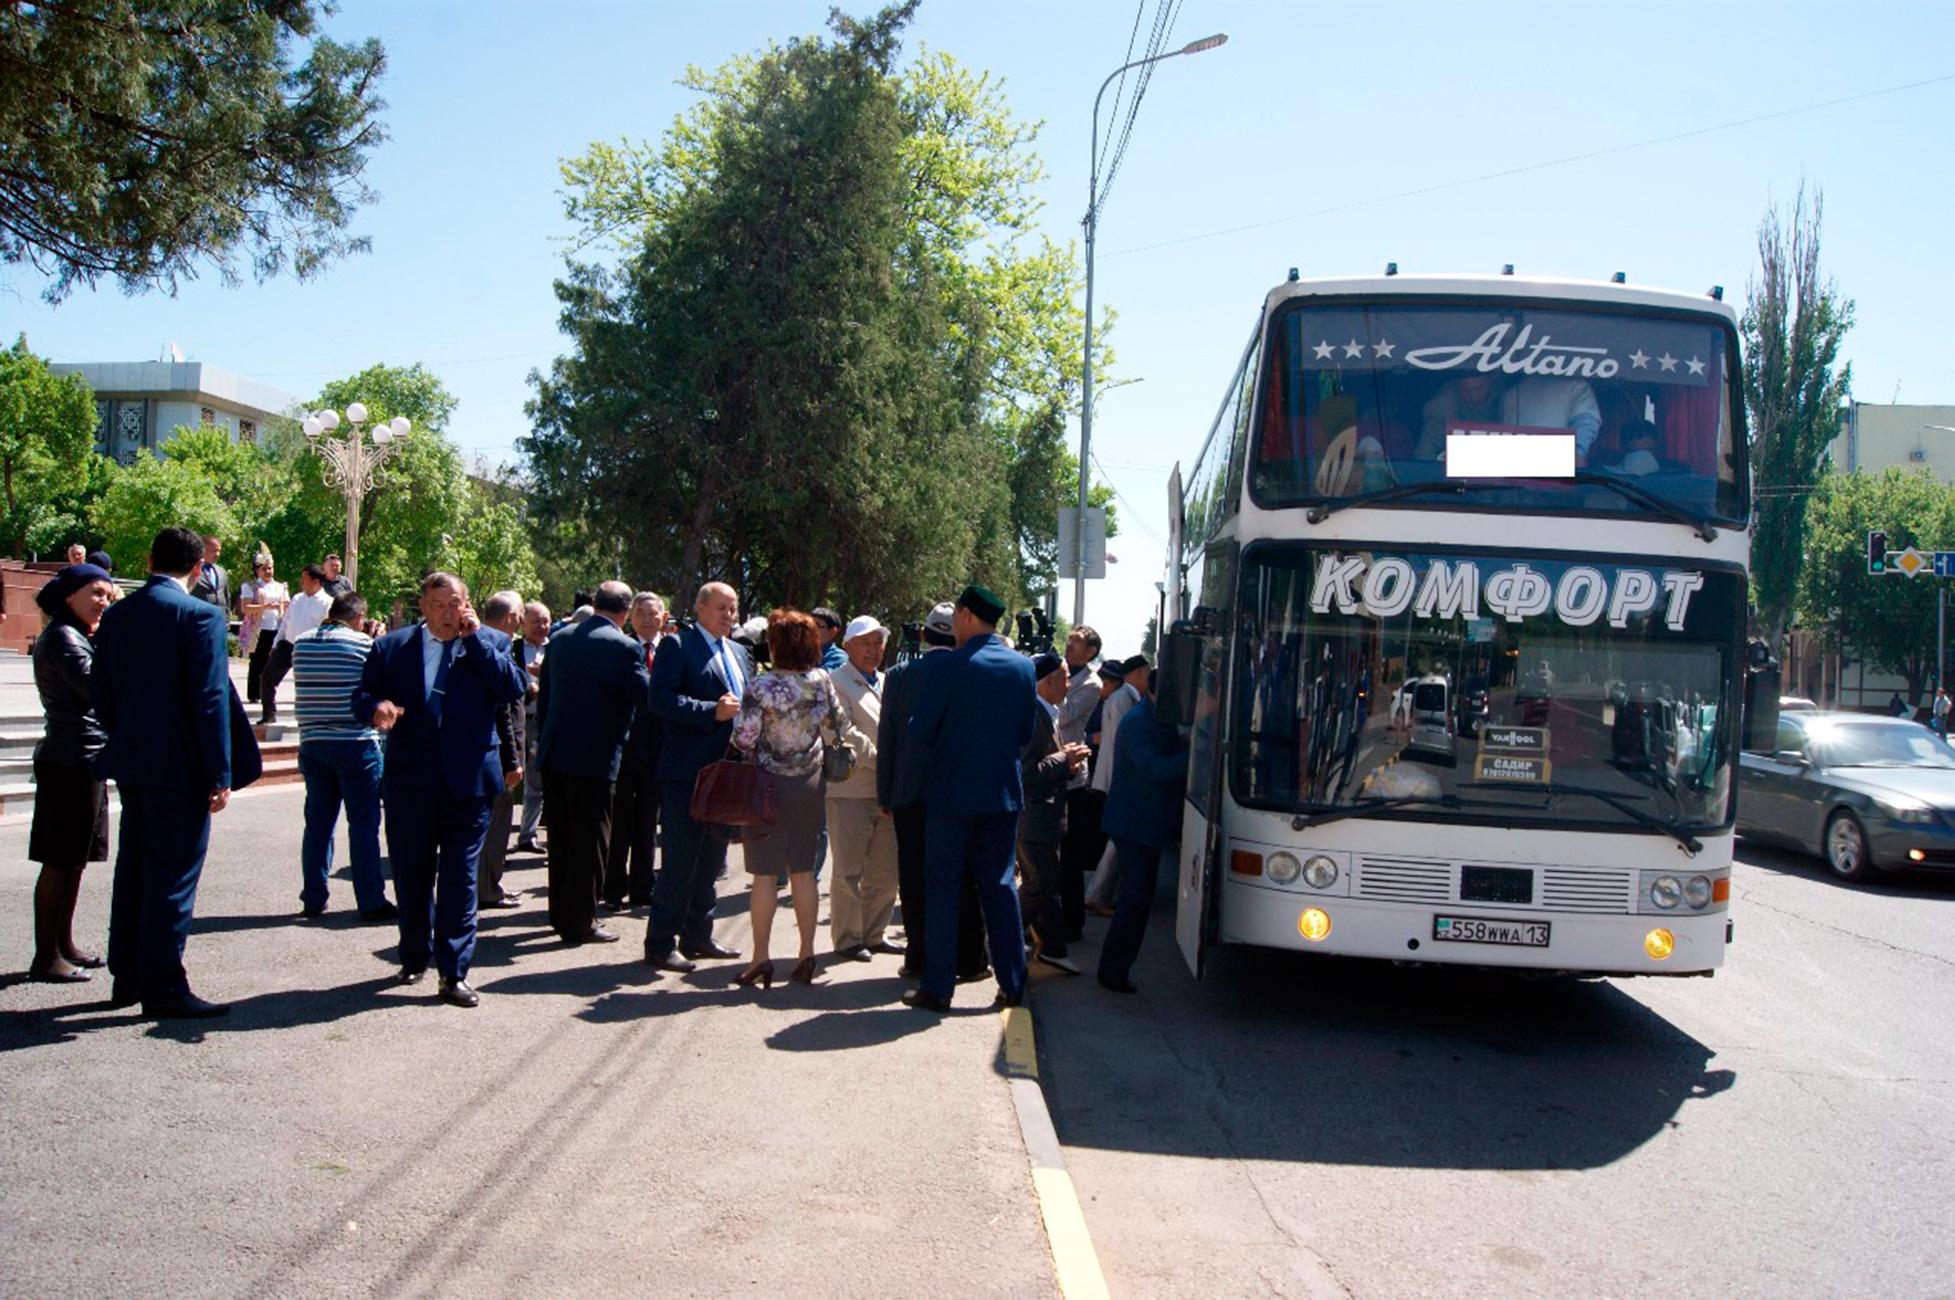 New era of co-operation between Kazakhstan, Uzbekistan bringing benefits